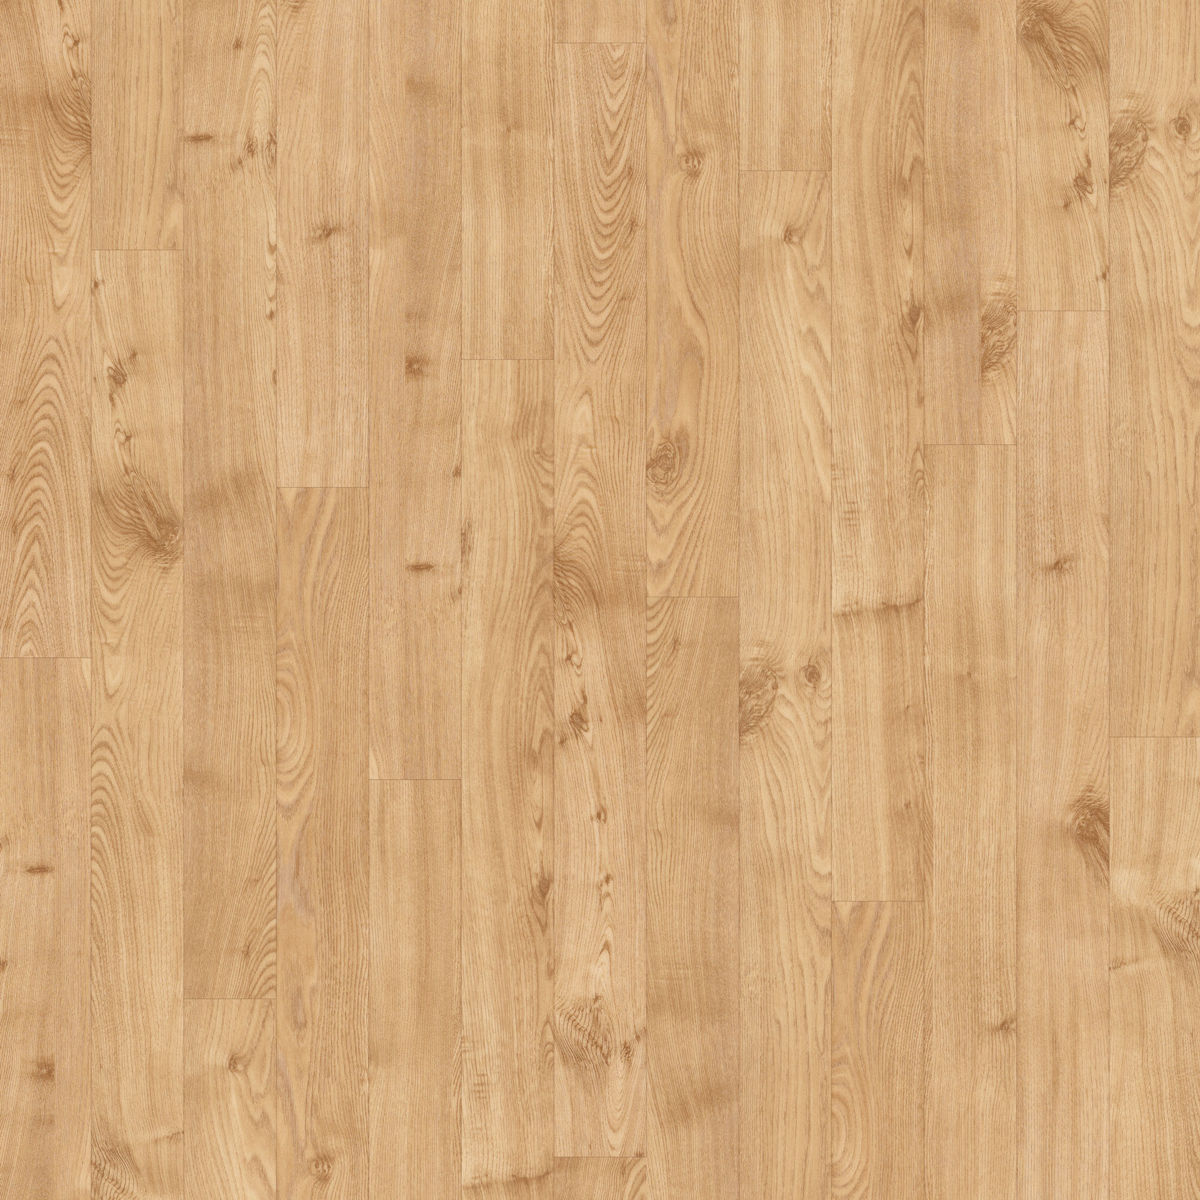 Karndean da vinci american oak rp11 vinyl flooring for Parquet flooring